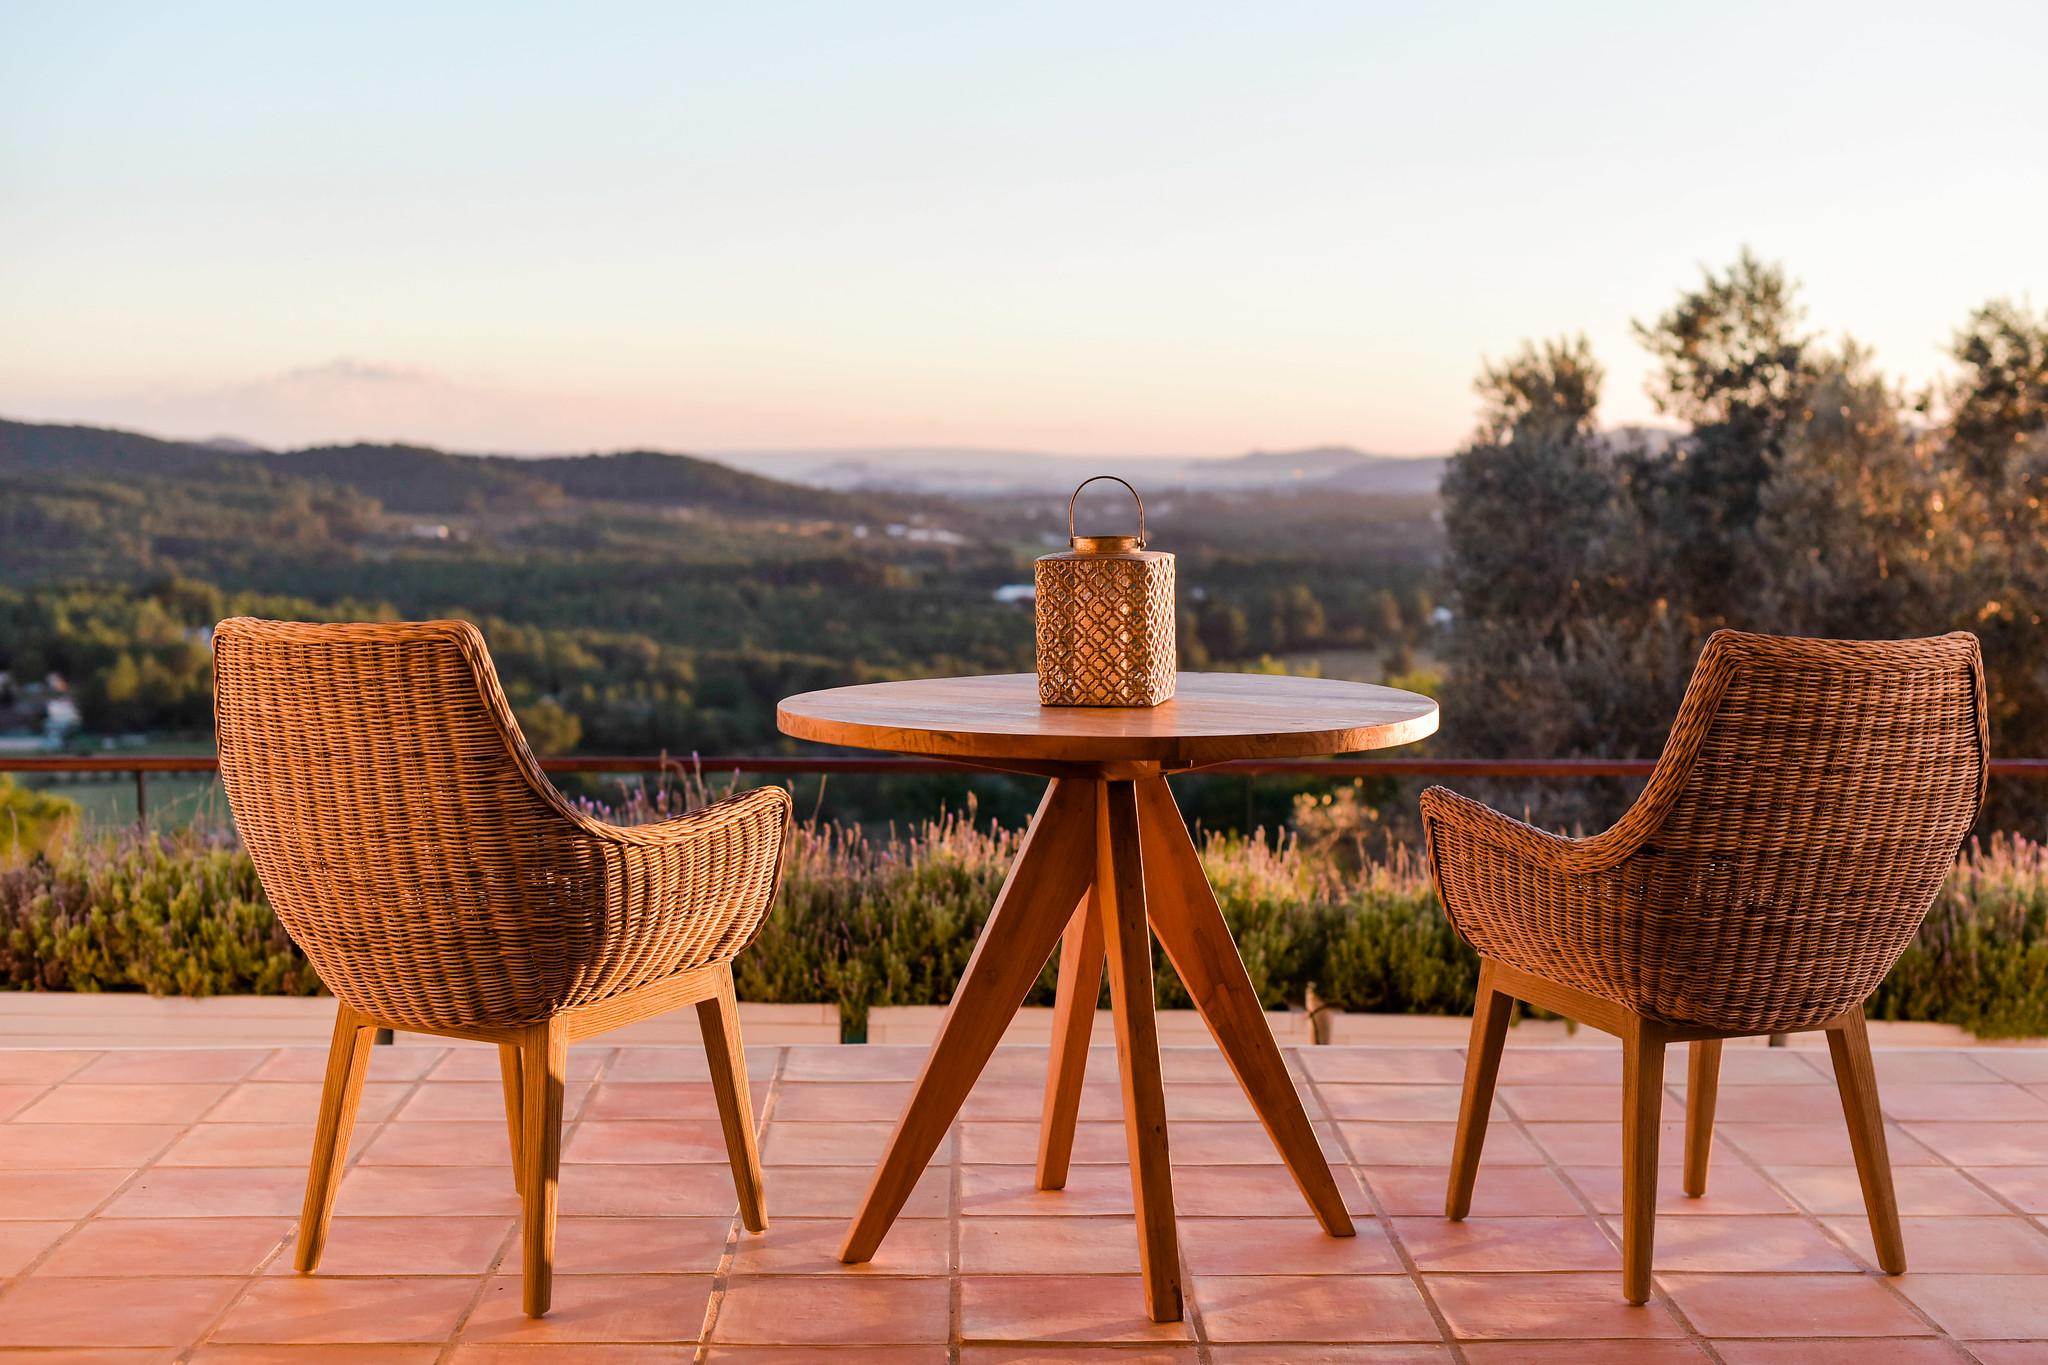 https://www.white-ibiza.com/wp-content/uploads/2020/05/white-ibiza-villas-can-lavanda-master-terrace.jpg